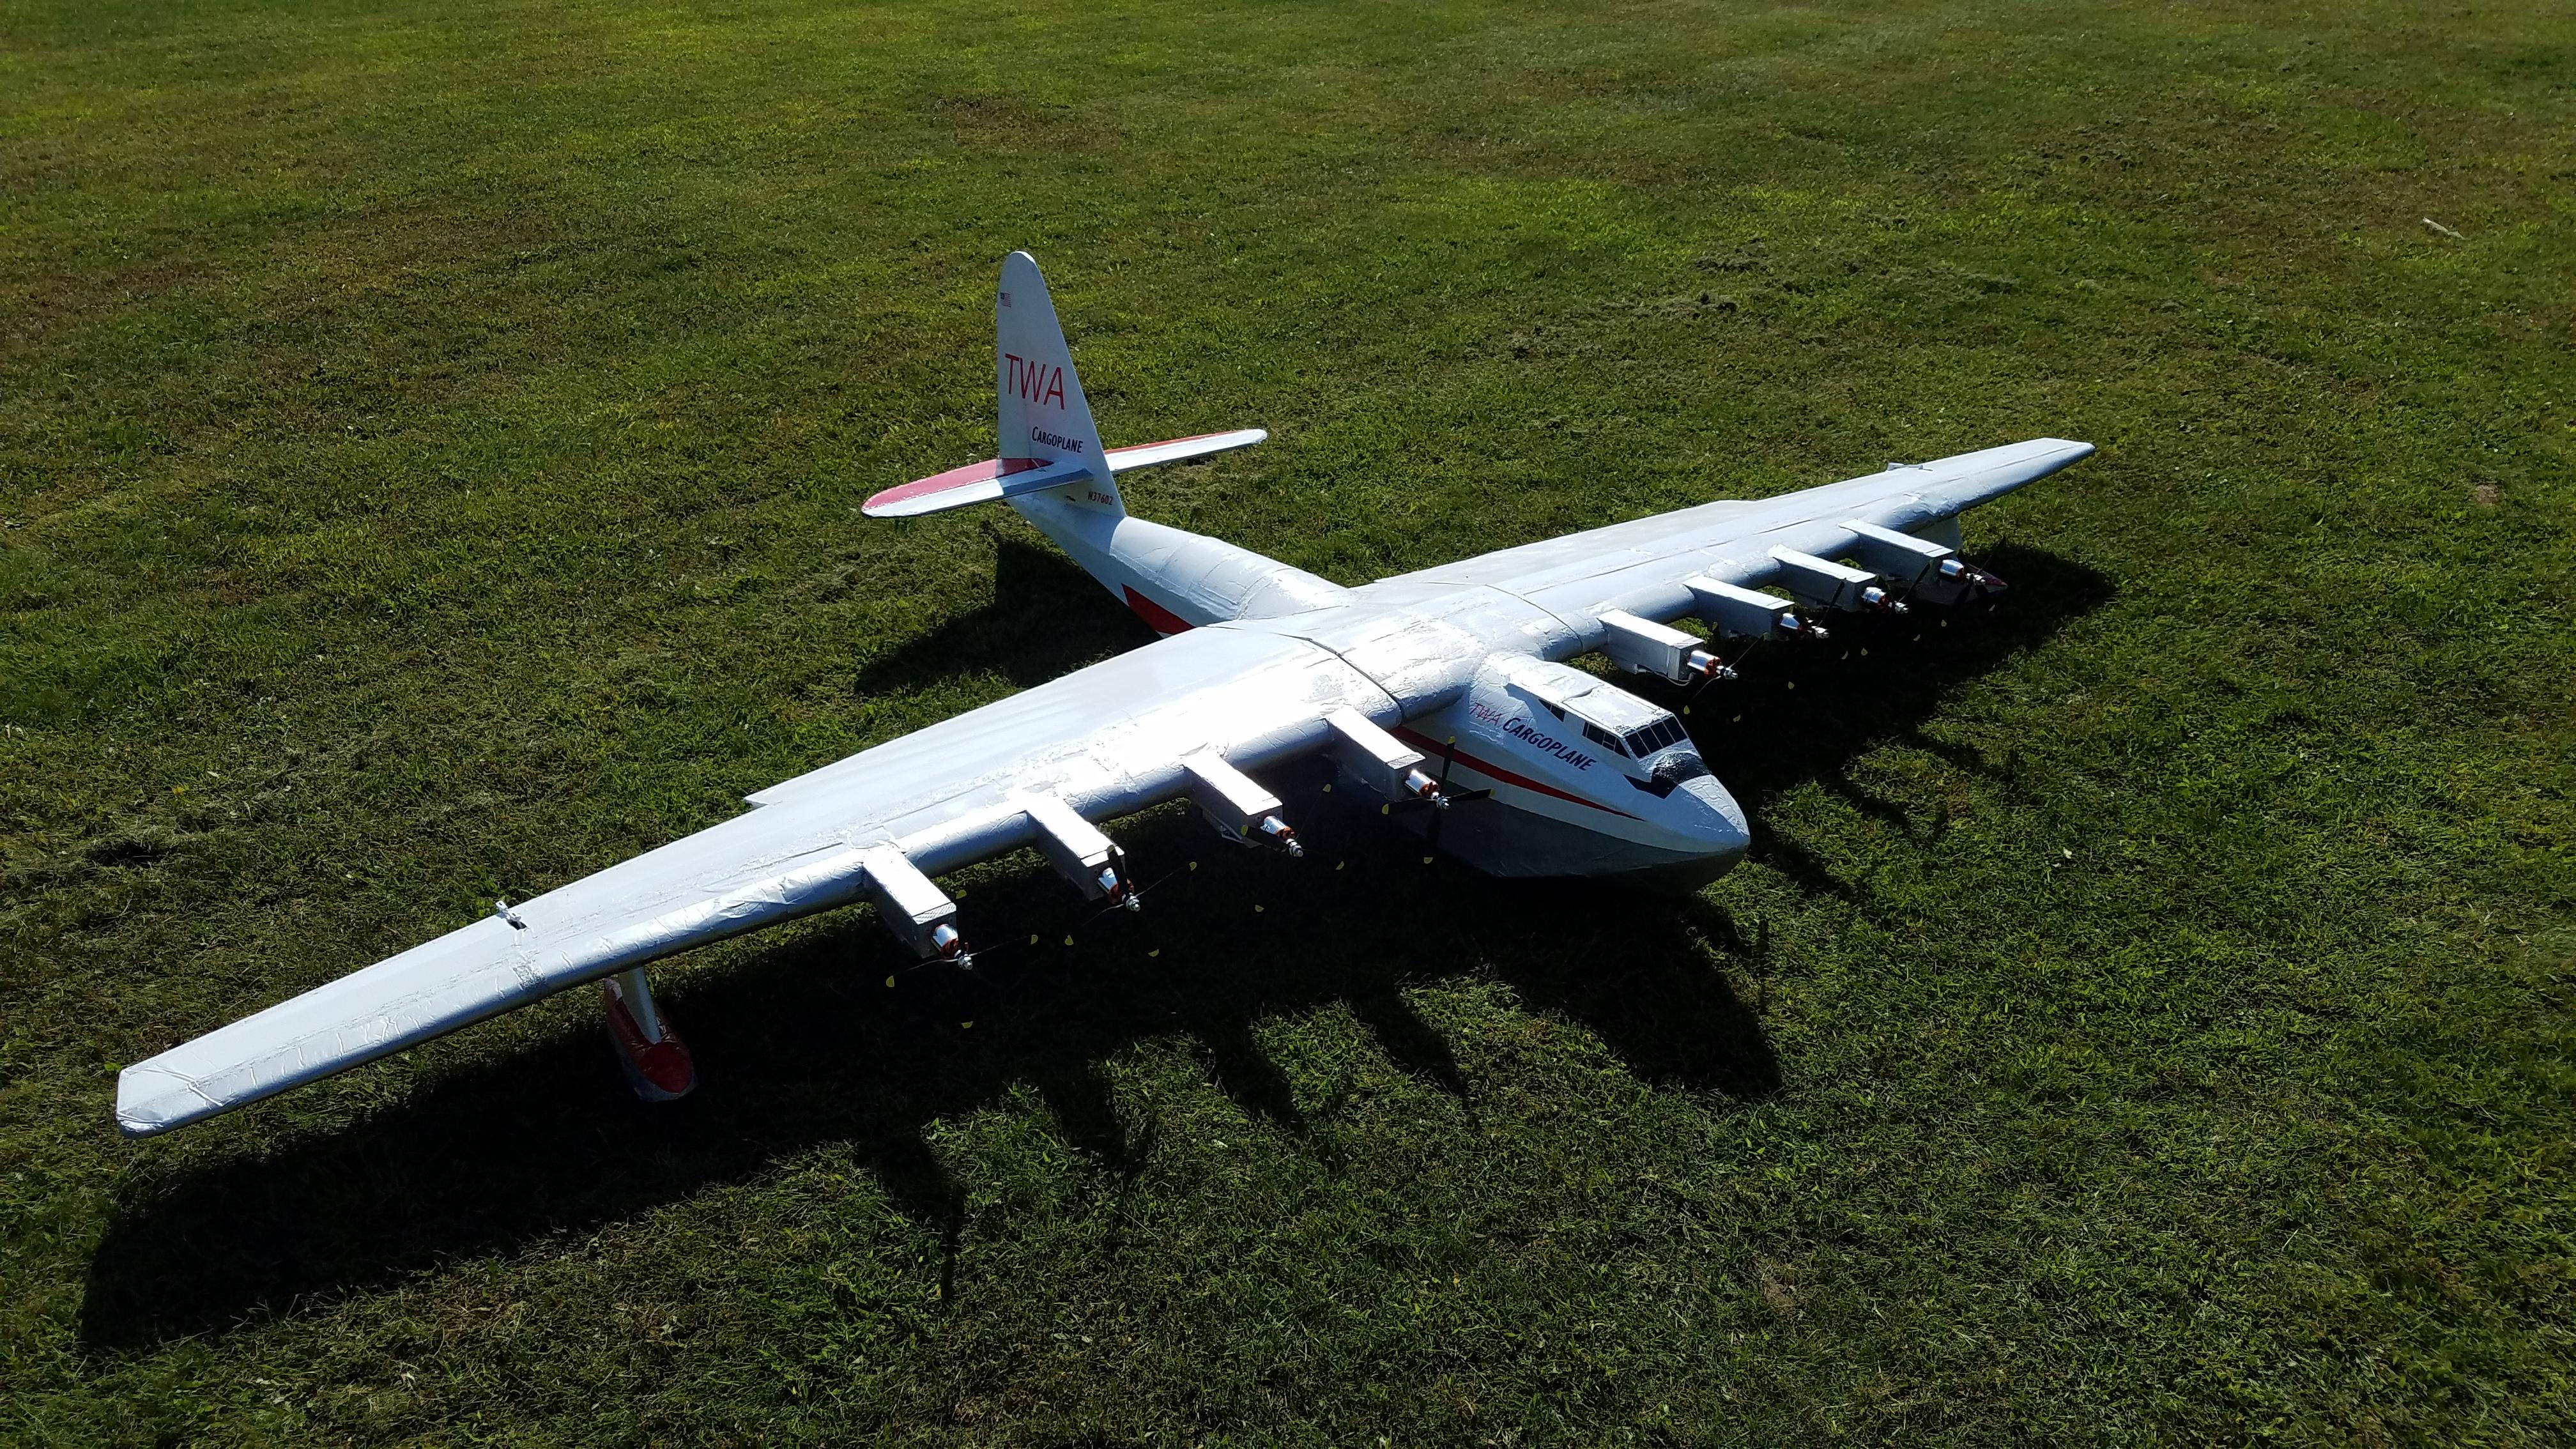 Top 10 Community DIY Planes of 2018 | Flite Test